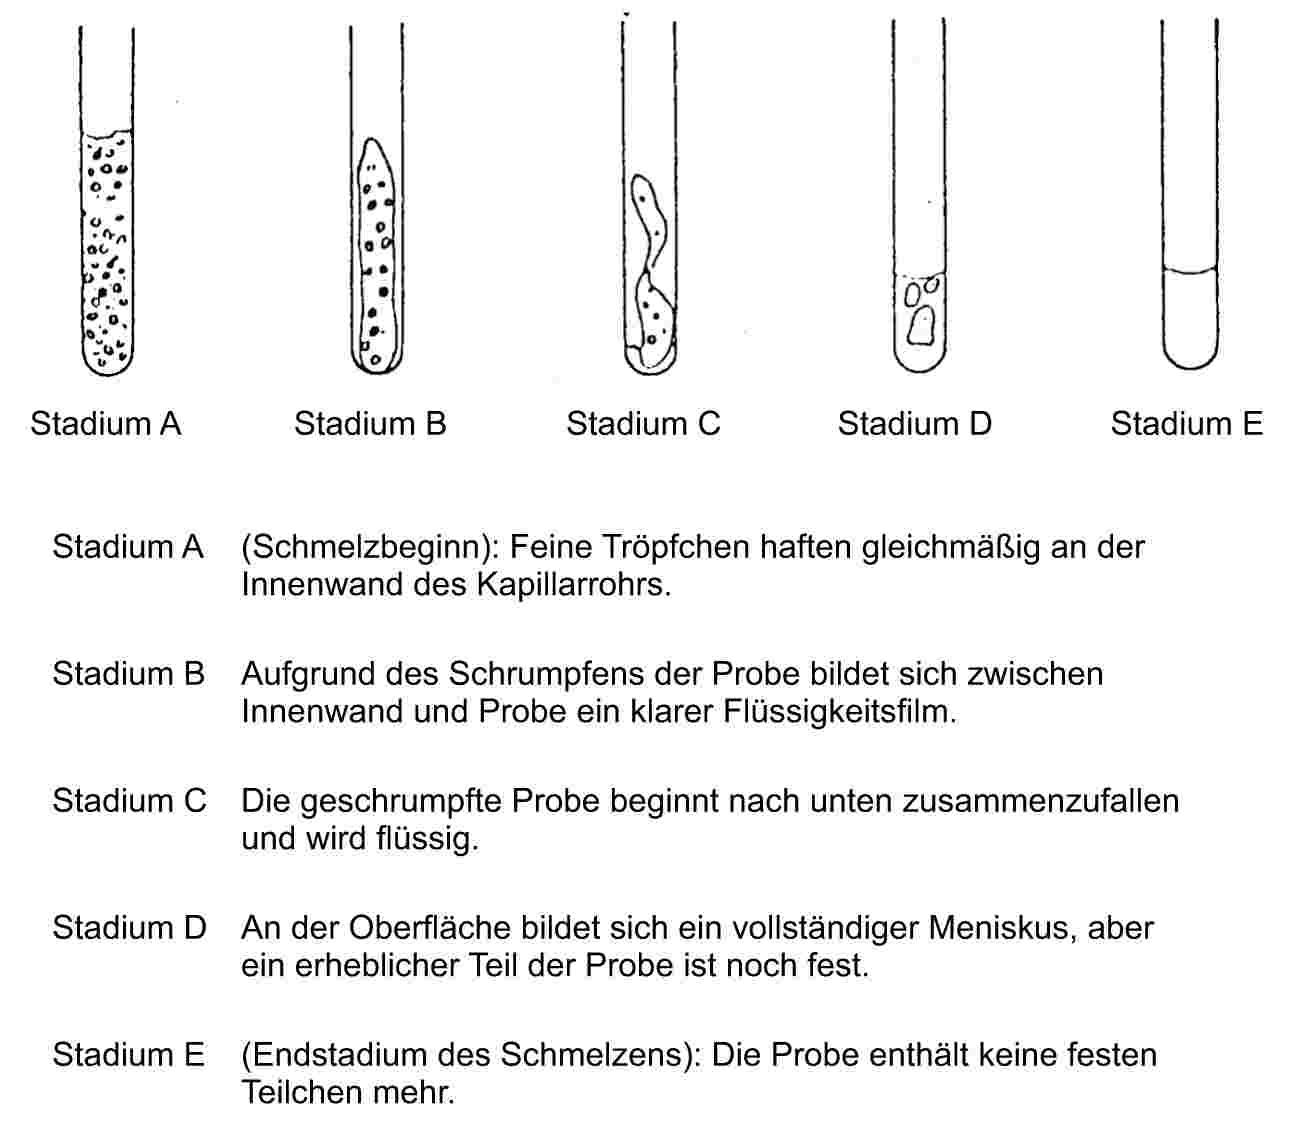 EUR-Lex - 02008R0440-20120723 - EN - EUR-Lex